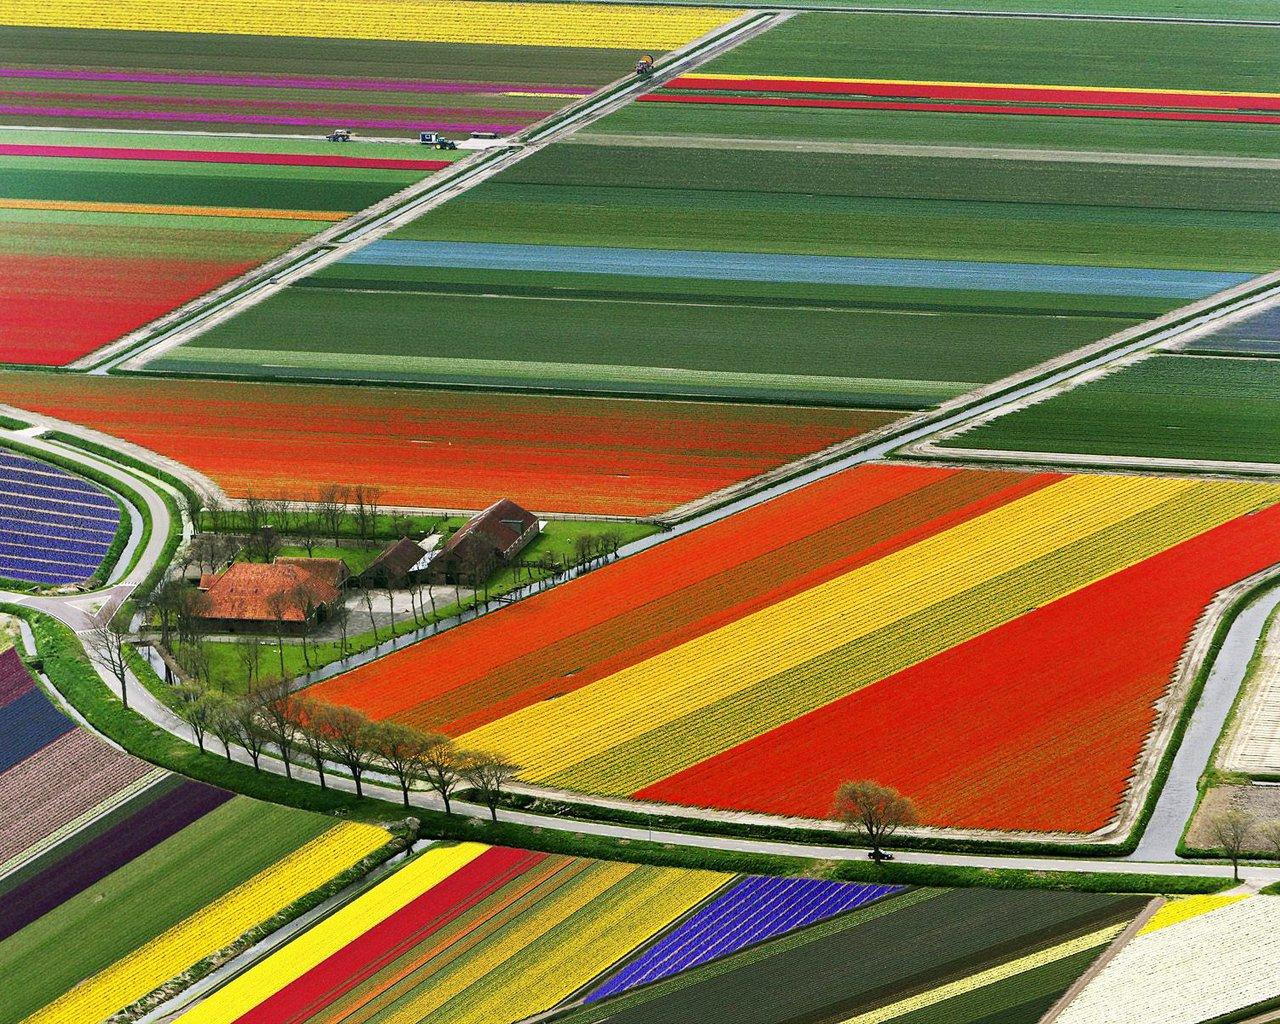 Wallpaper ธรรมชาติ สวยงาม